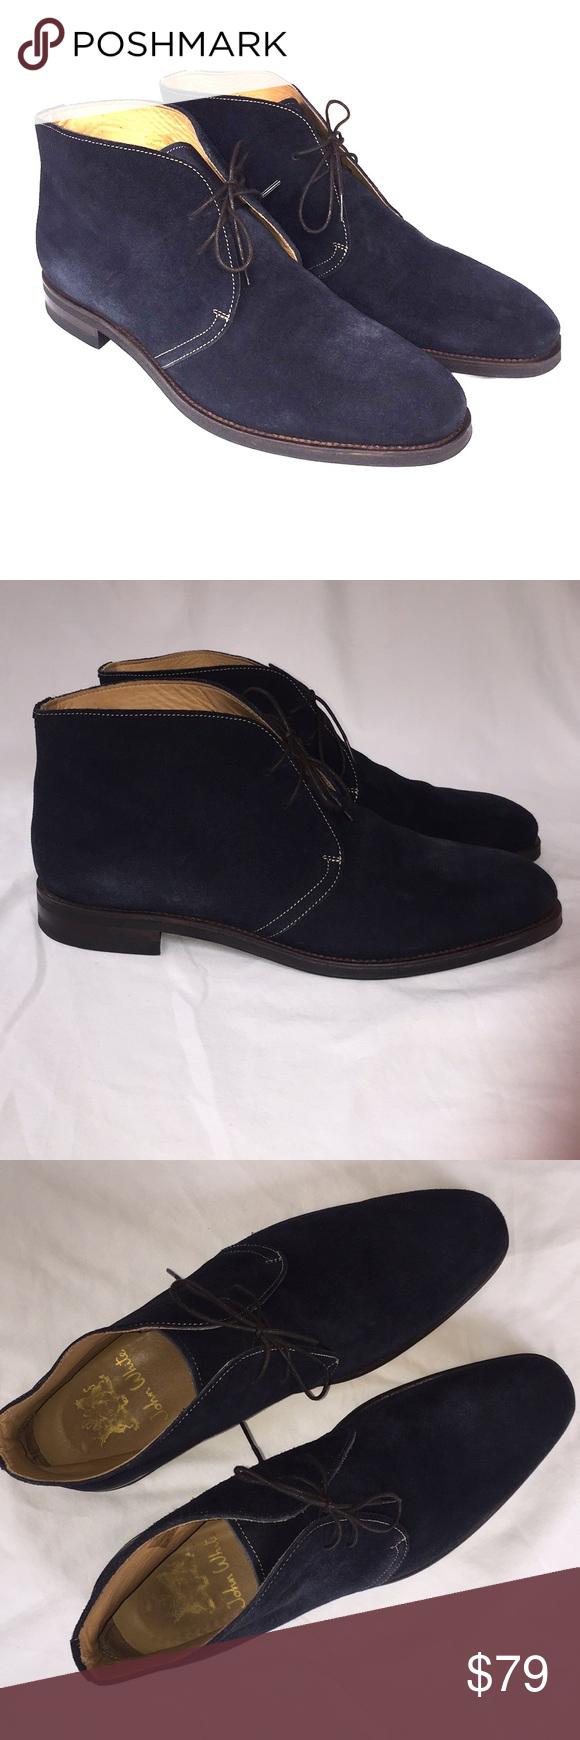 John White Westbury Blue Suede Boots Blue Suede Boots John White Shoes Boots